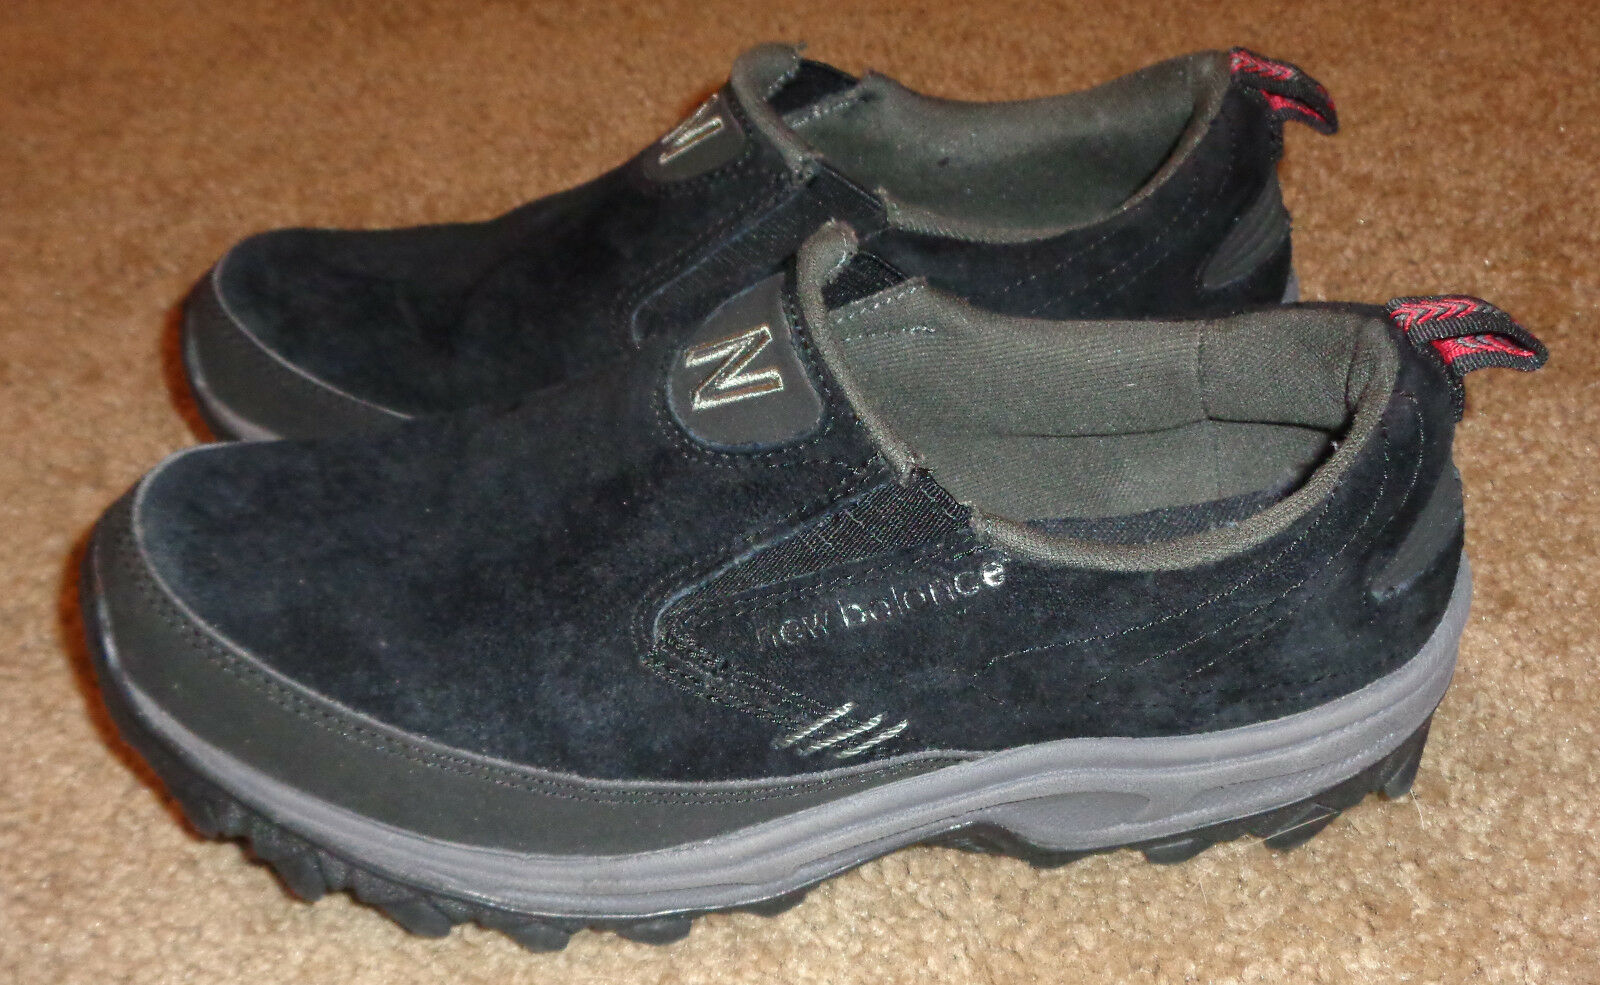 Black Men's New Balance 756v2 Country Walking Shoe Size 7 US 5 CM